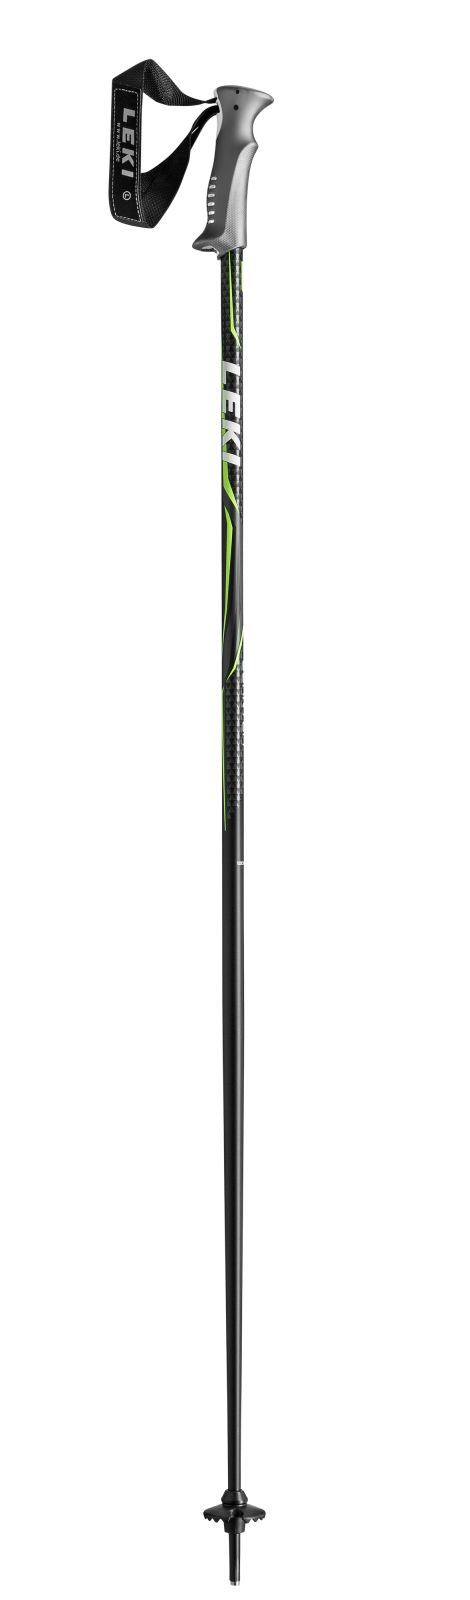 Leki Quantum Ski Poles